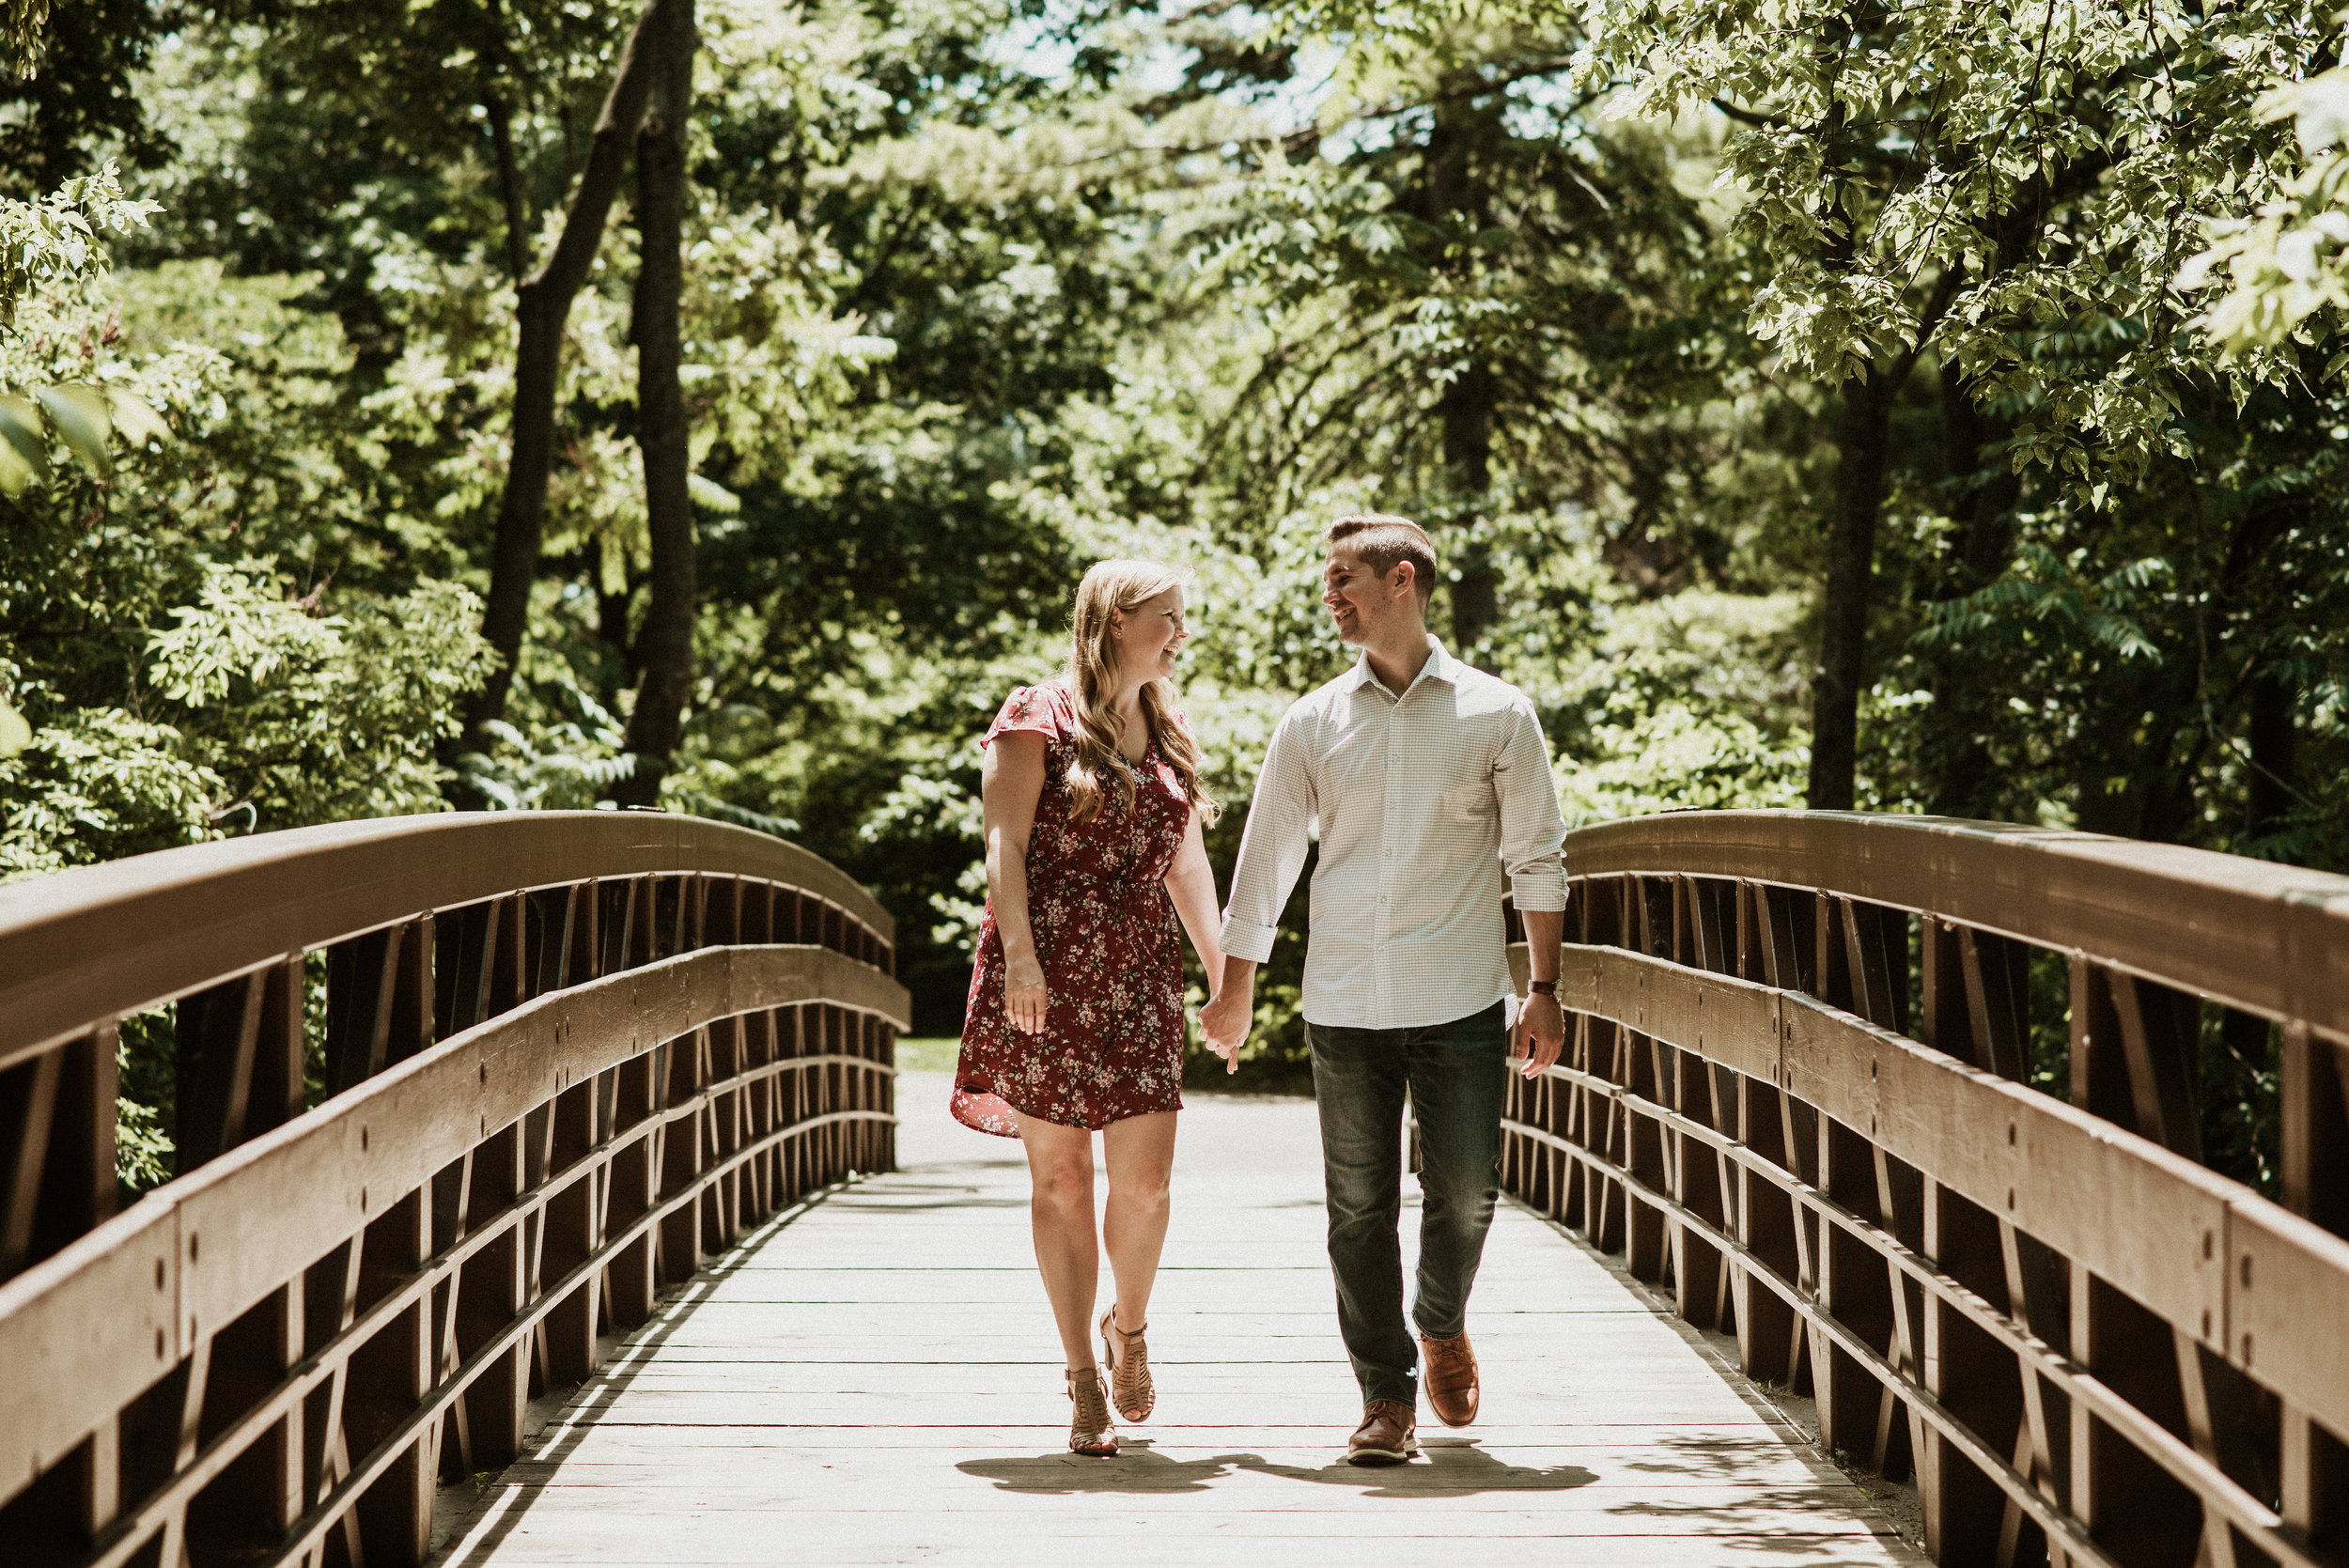 Emily and Brett | Hot Summer Days | Moser Tower Engagement Session & Naperville Riverwalk | Naperville, IL | Chicago Wedding Photogapher